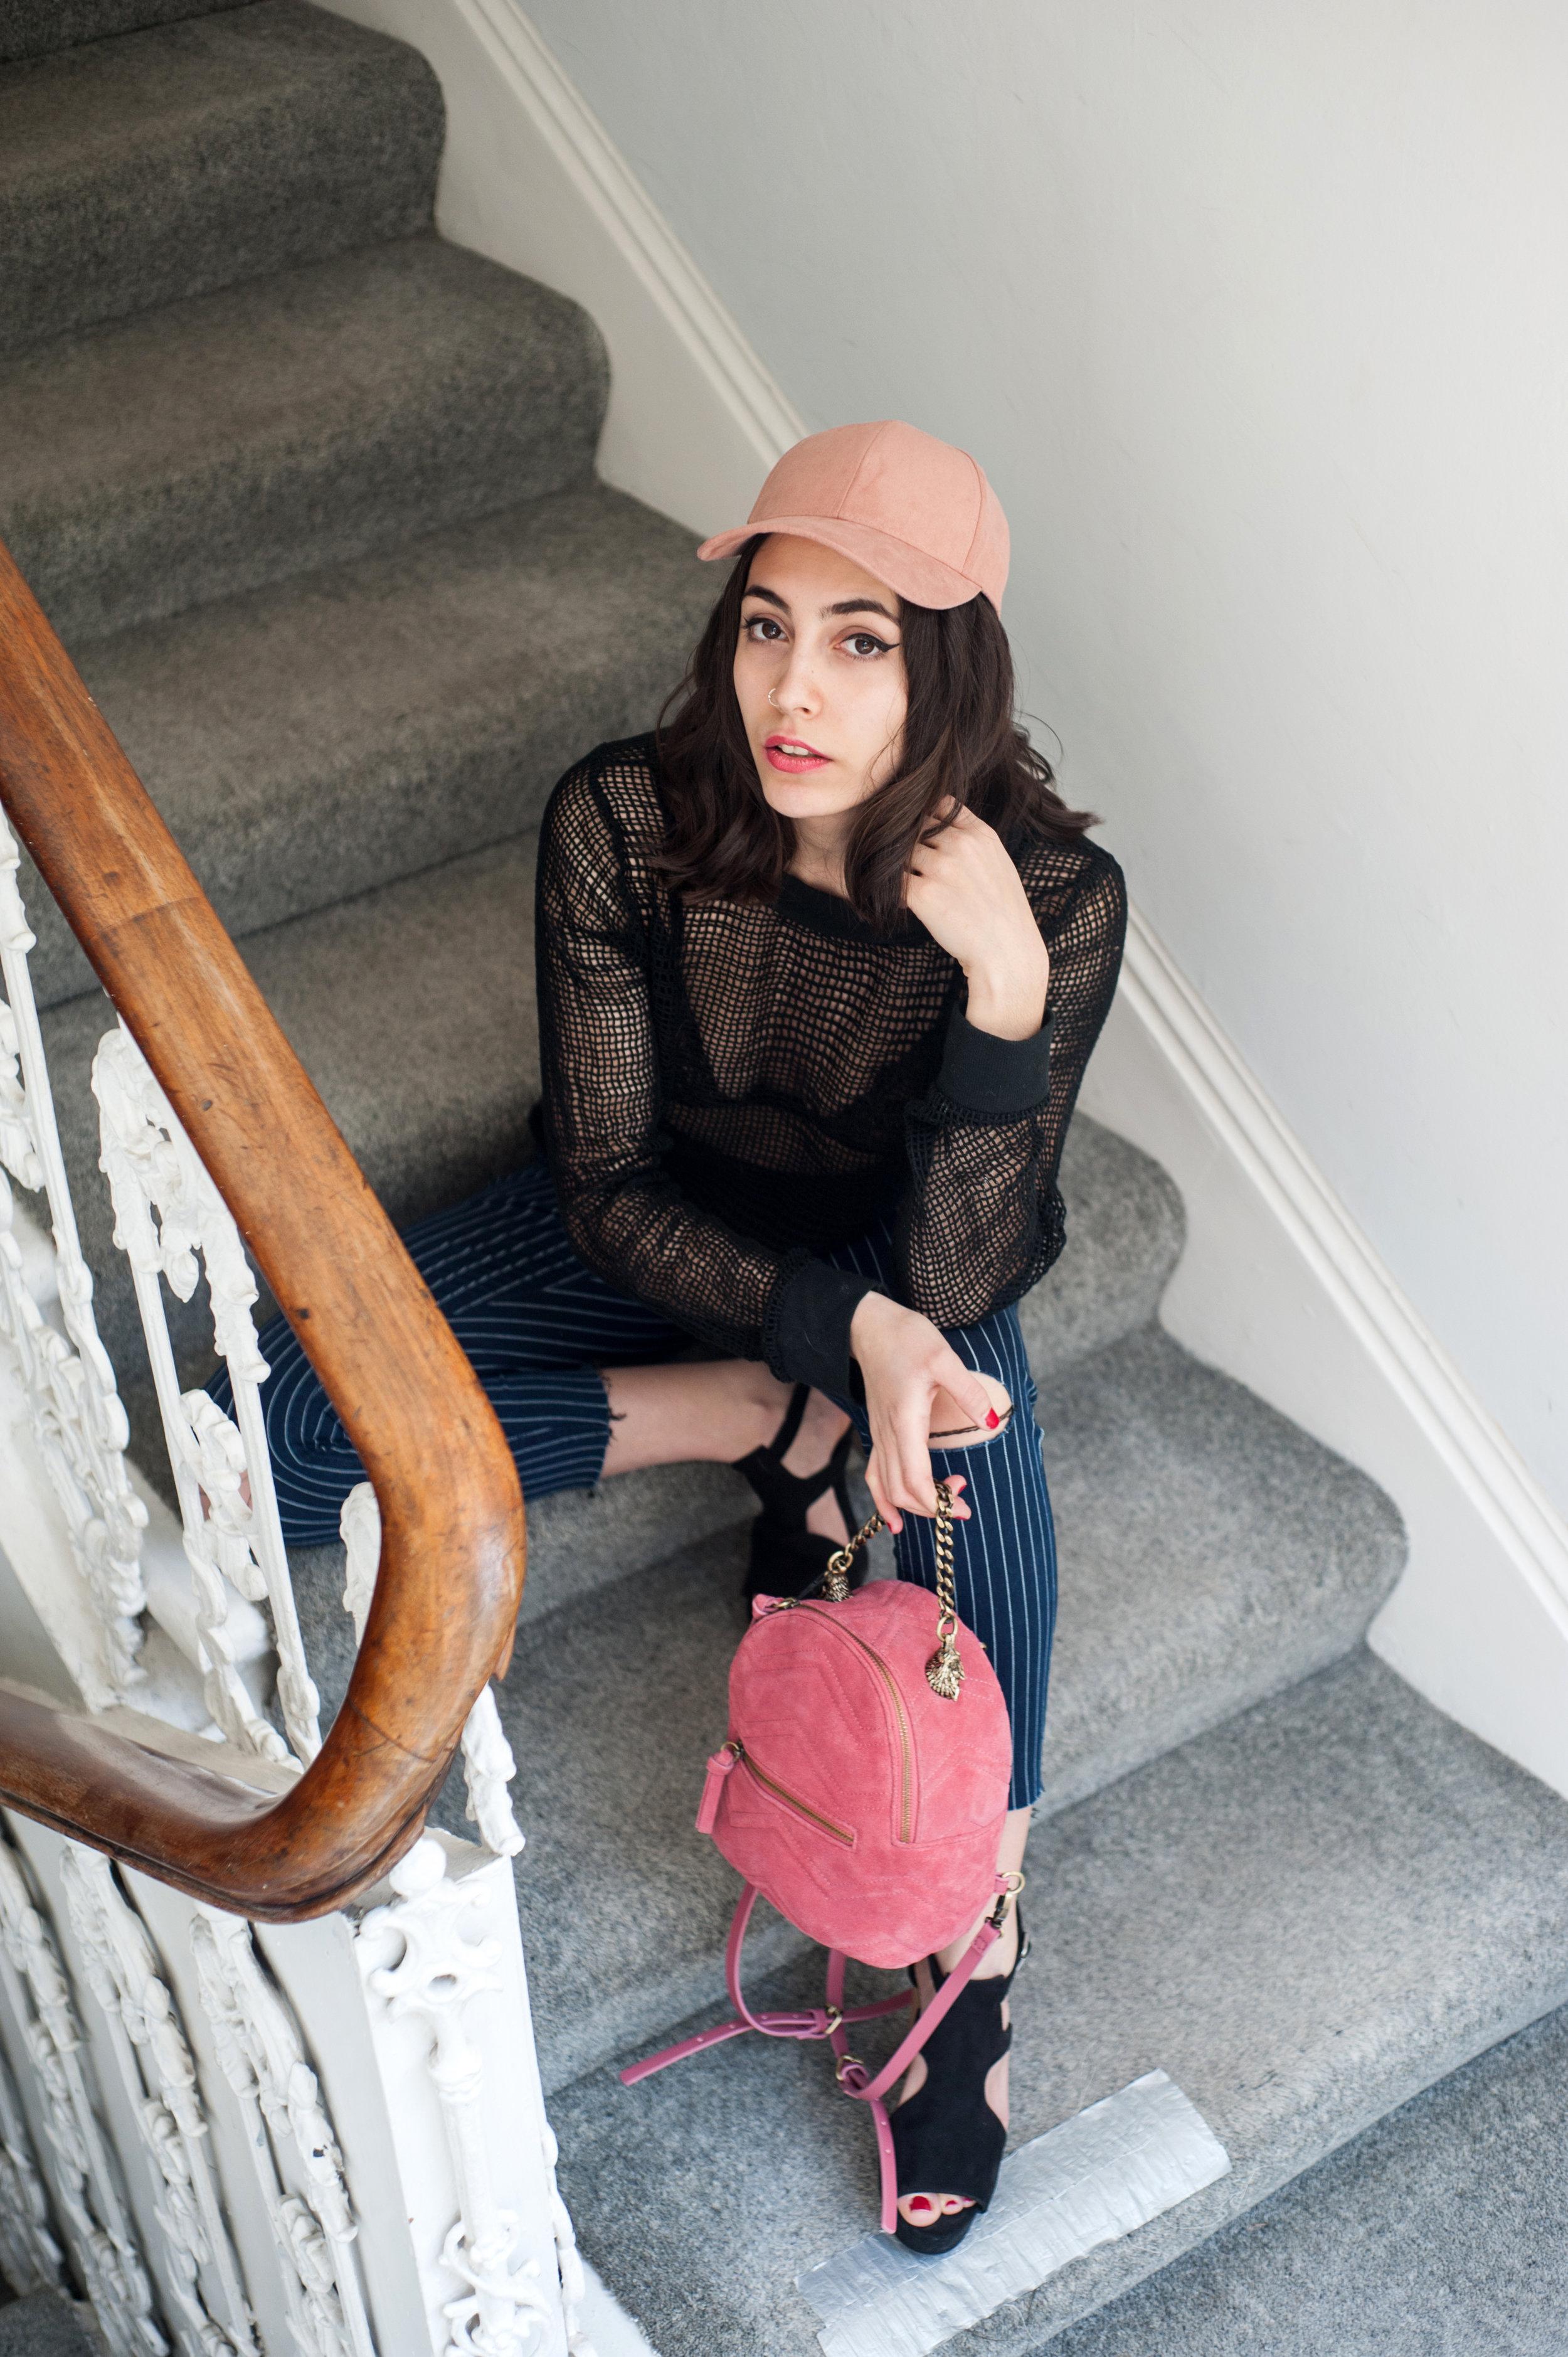 bra-lace-missguided-mesh-fishnet-top-pink-cap-backpack-zara.jpg